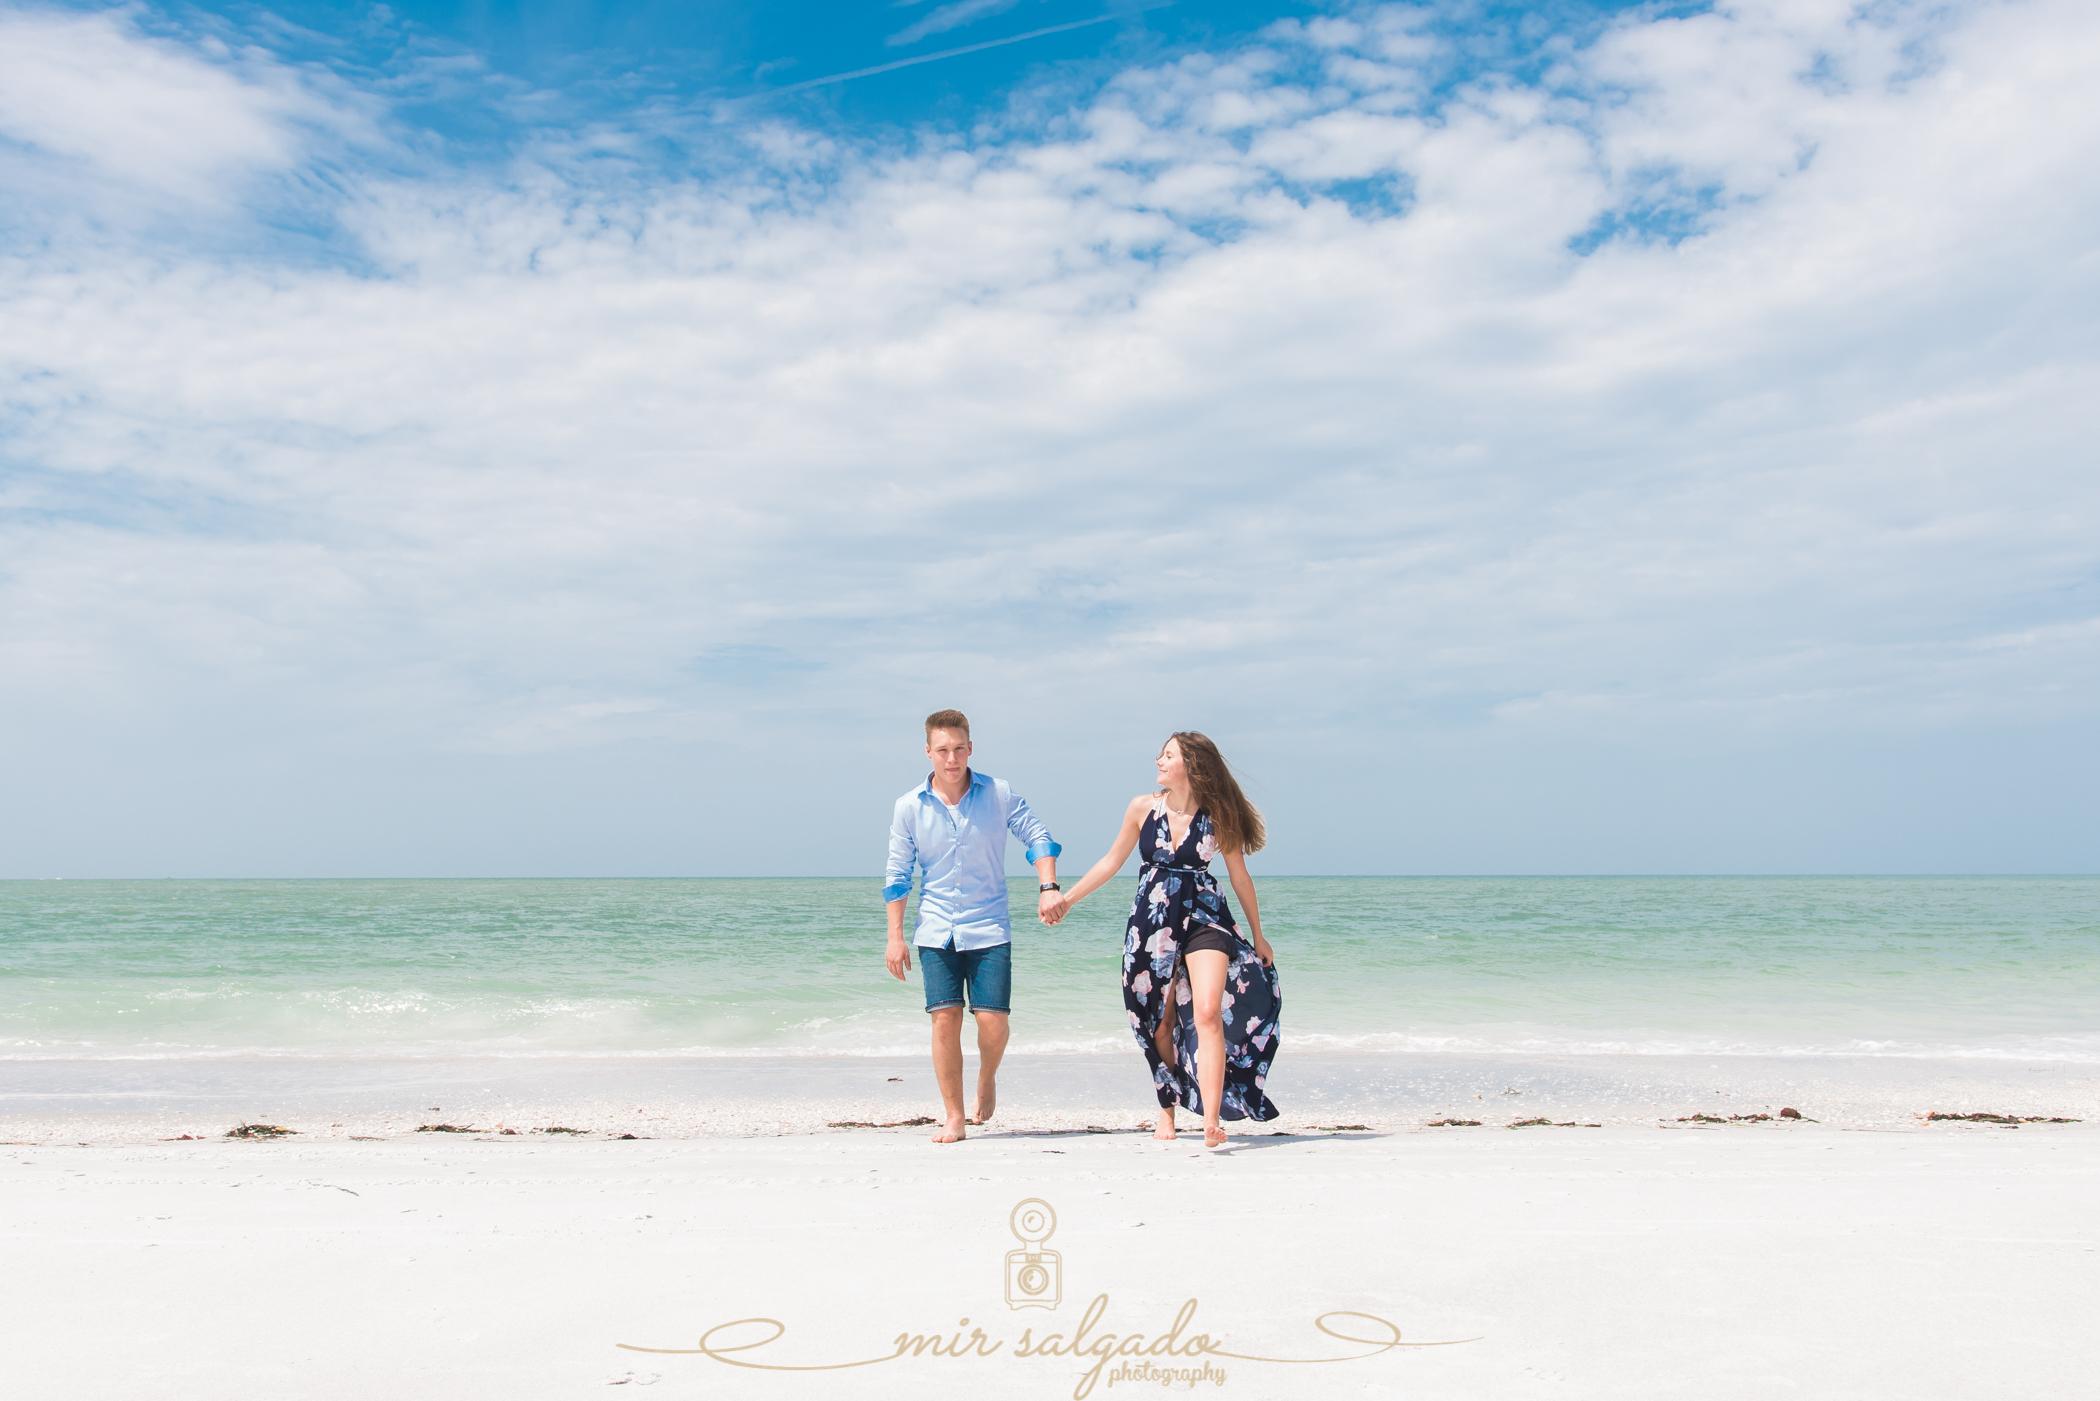 tampa-photographer-couple-session, sarasota-lido-key-beach, couples-portrait-session, vacation-florida-trip